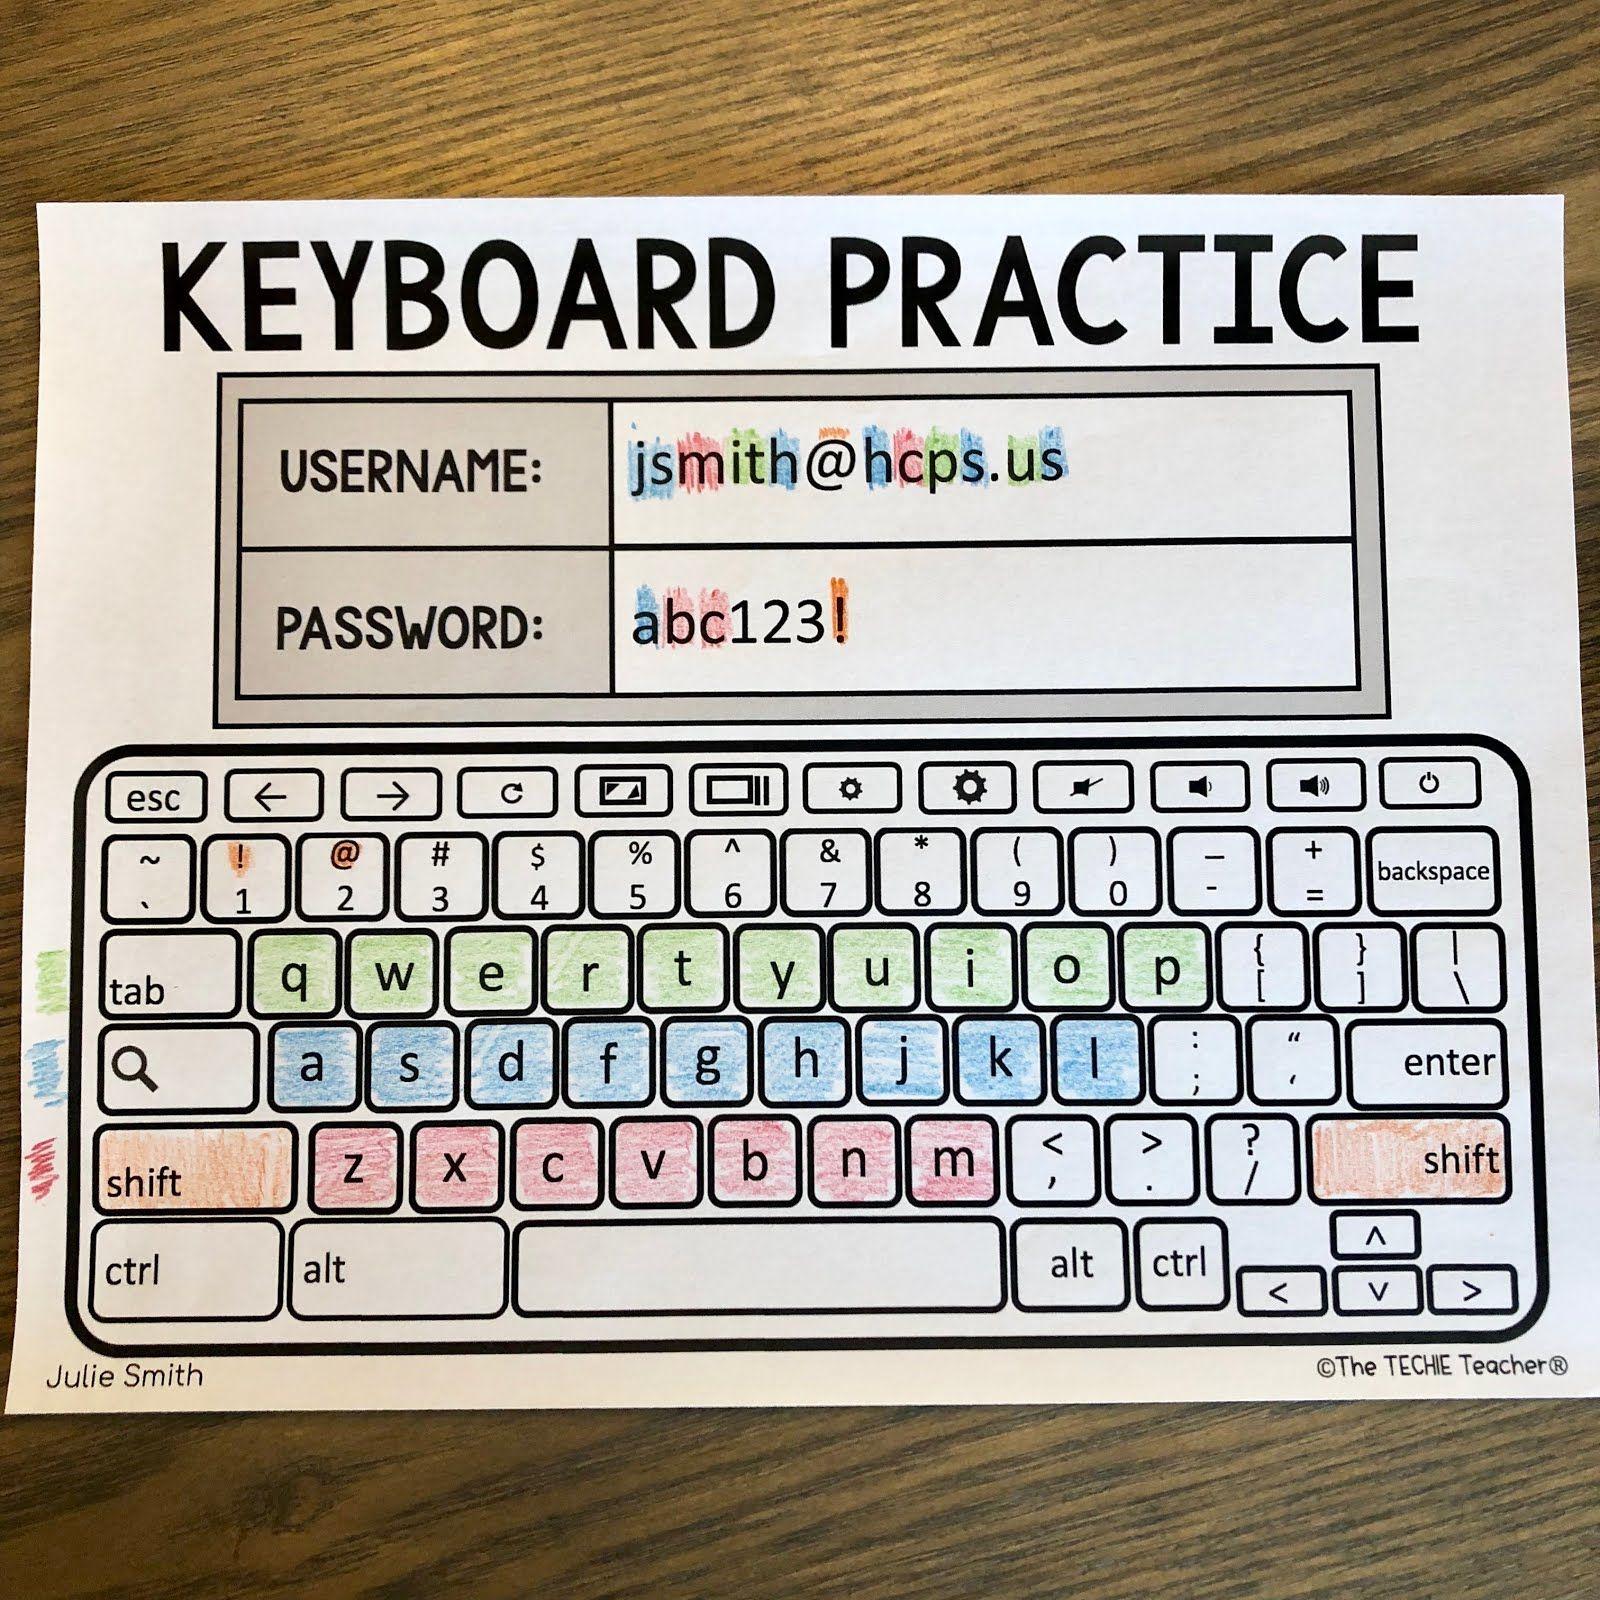 Truncale Chris Keyboarding Practice